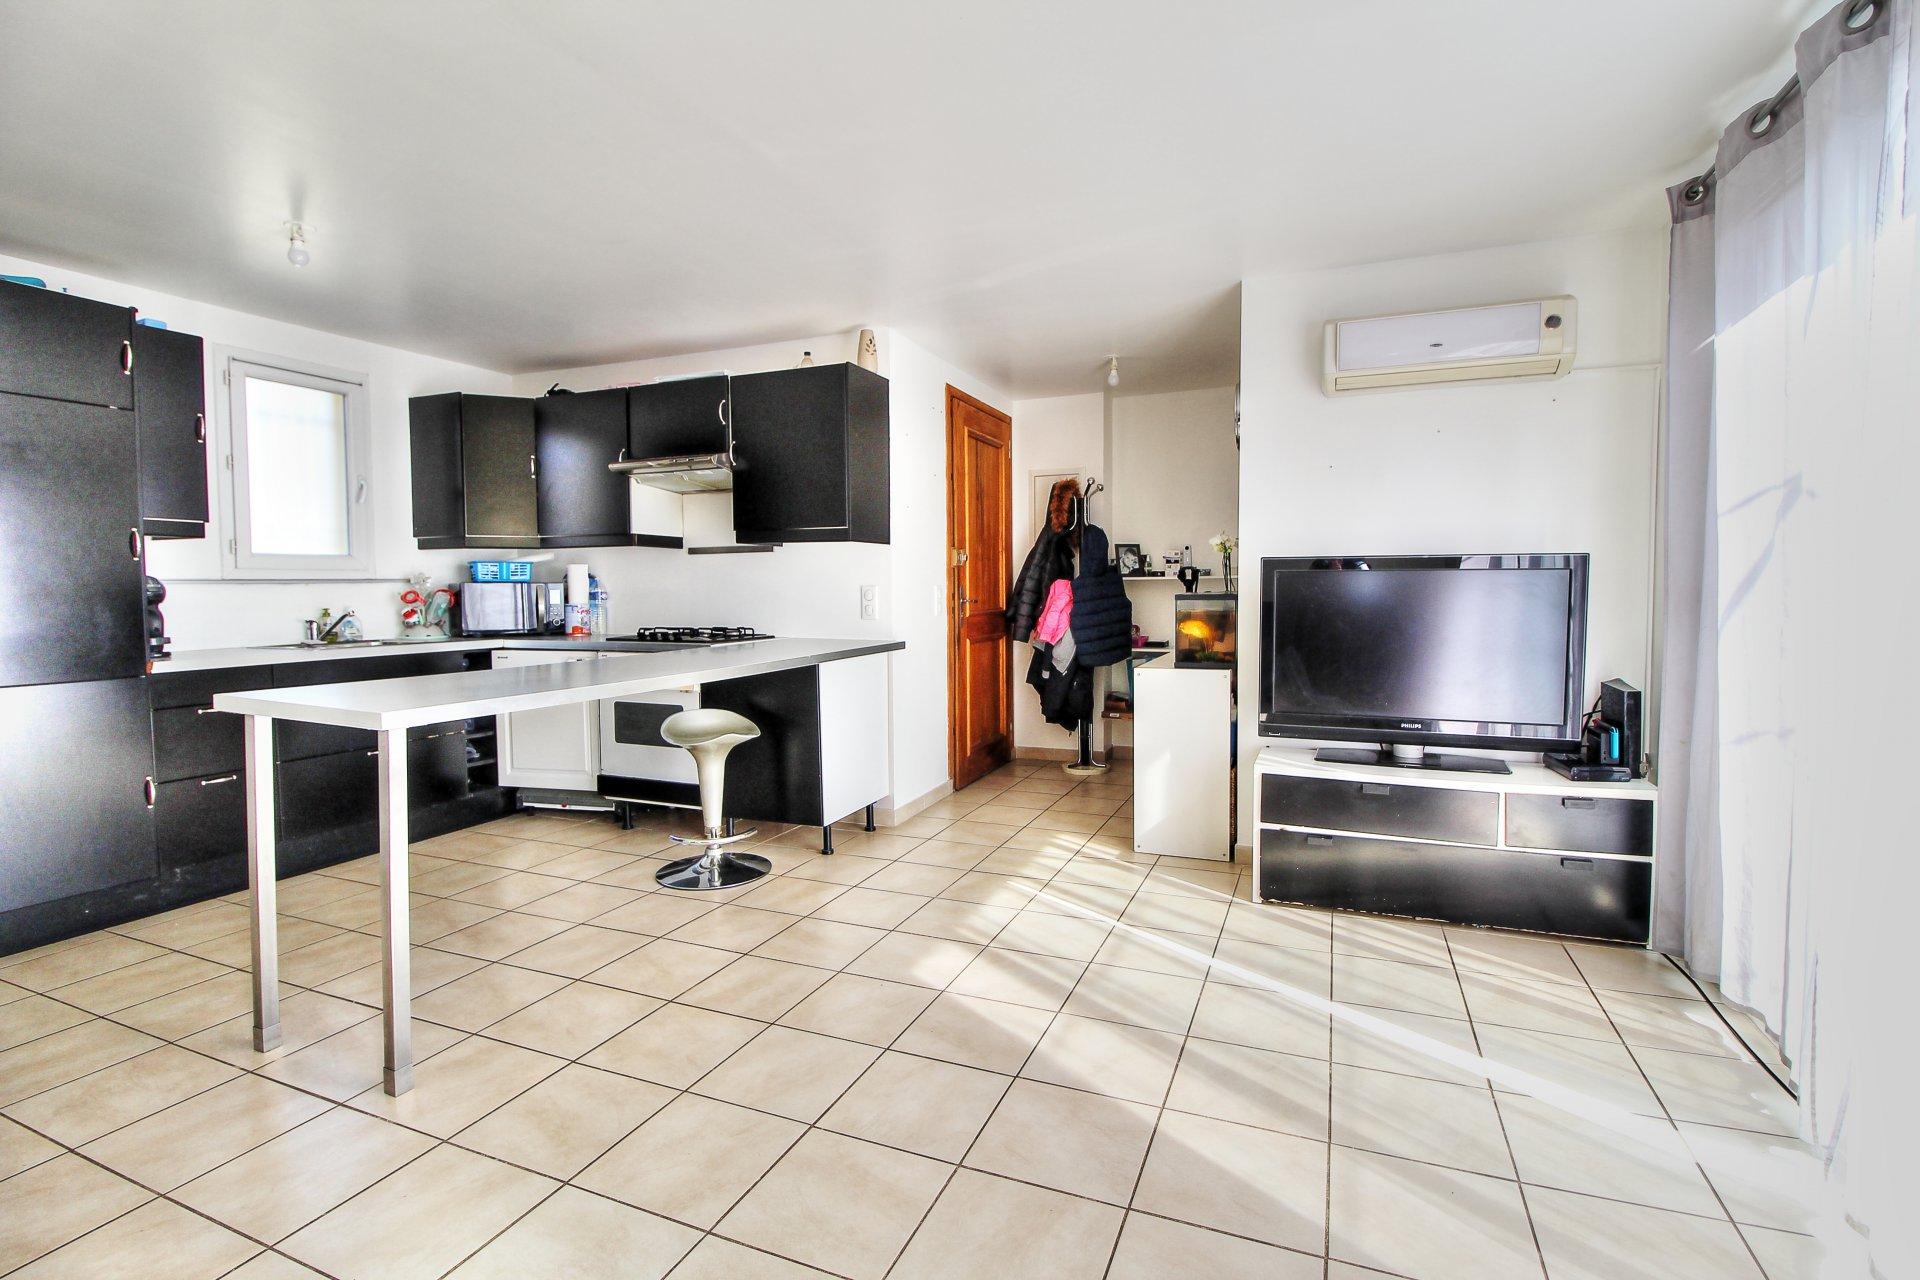 Fayence vente maison 2 chambres avec jardin